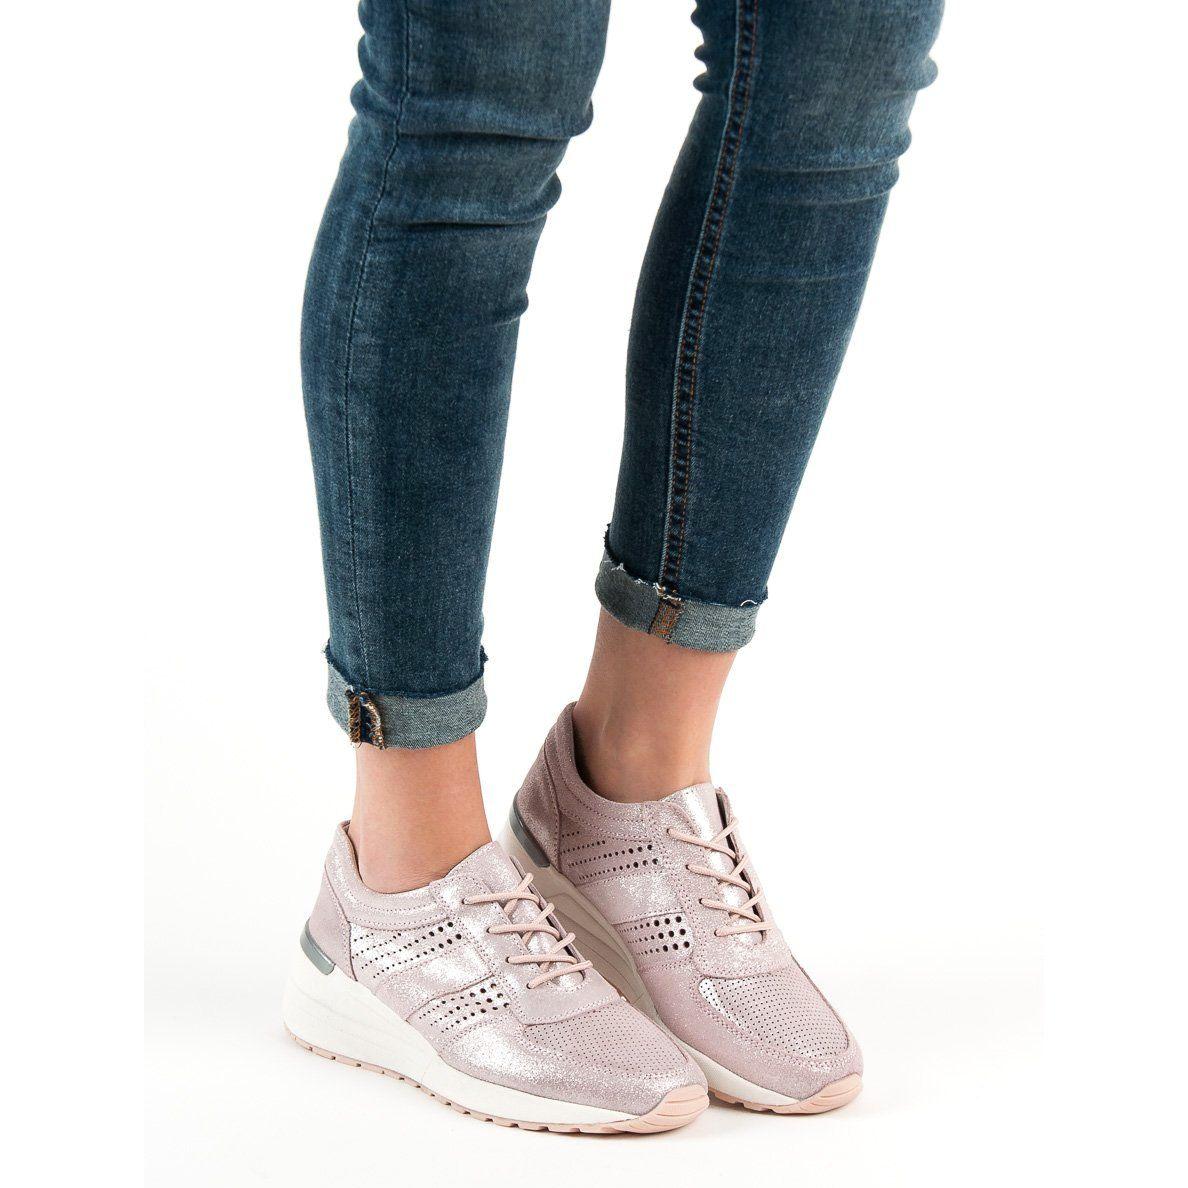 Filippo Skorzane Sneakersy Na Koturnie Rozowe Wedge Sneaker Shoes Sneakers